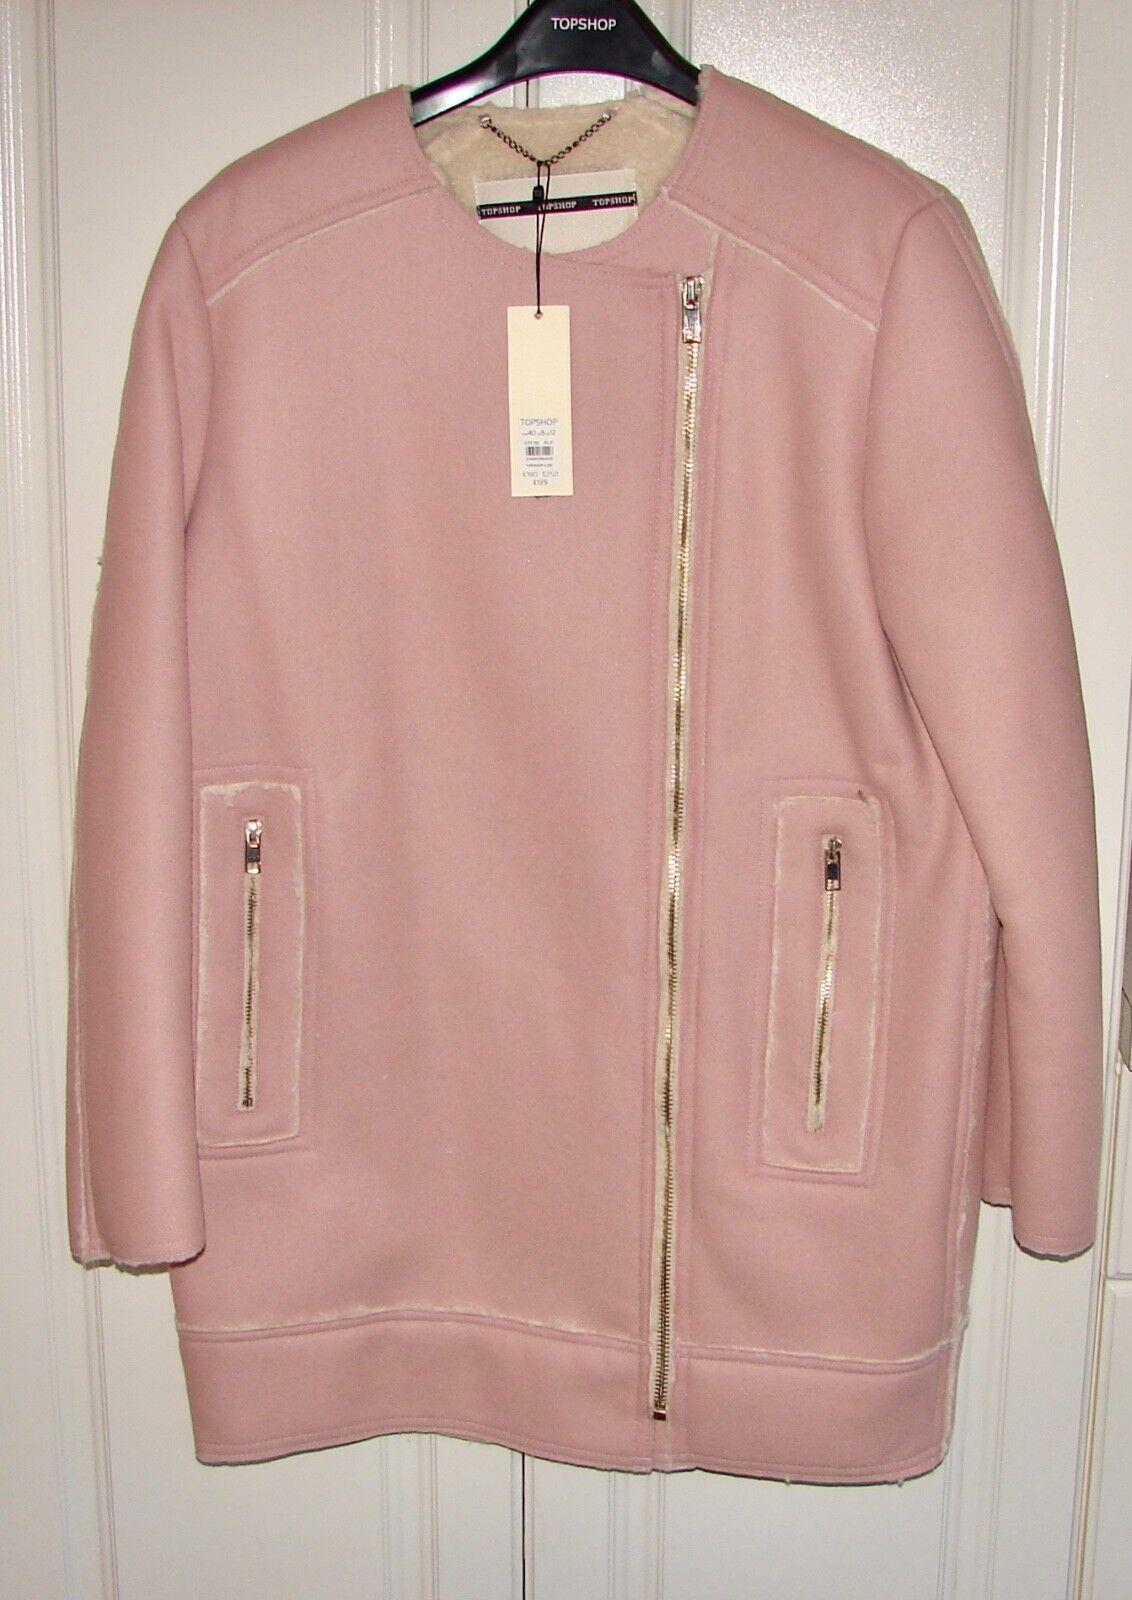 NWT Topshop sz 8 pink wool blend faux shearling zip-front coat